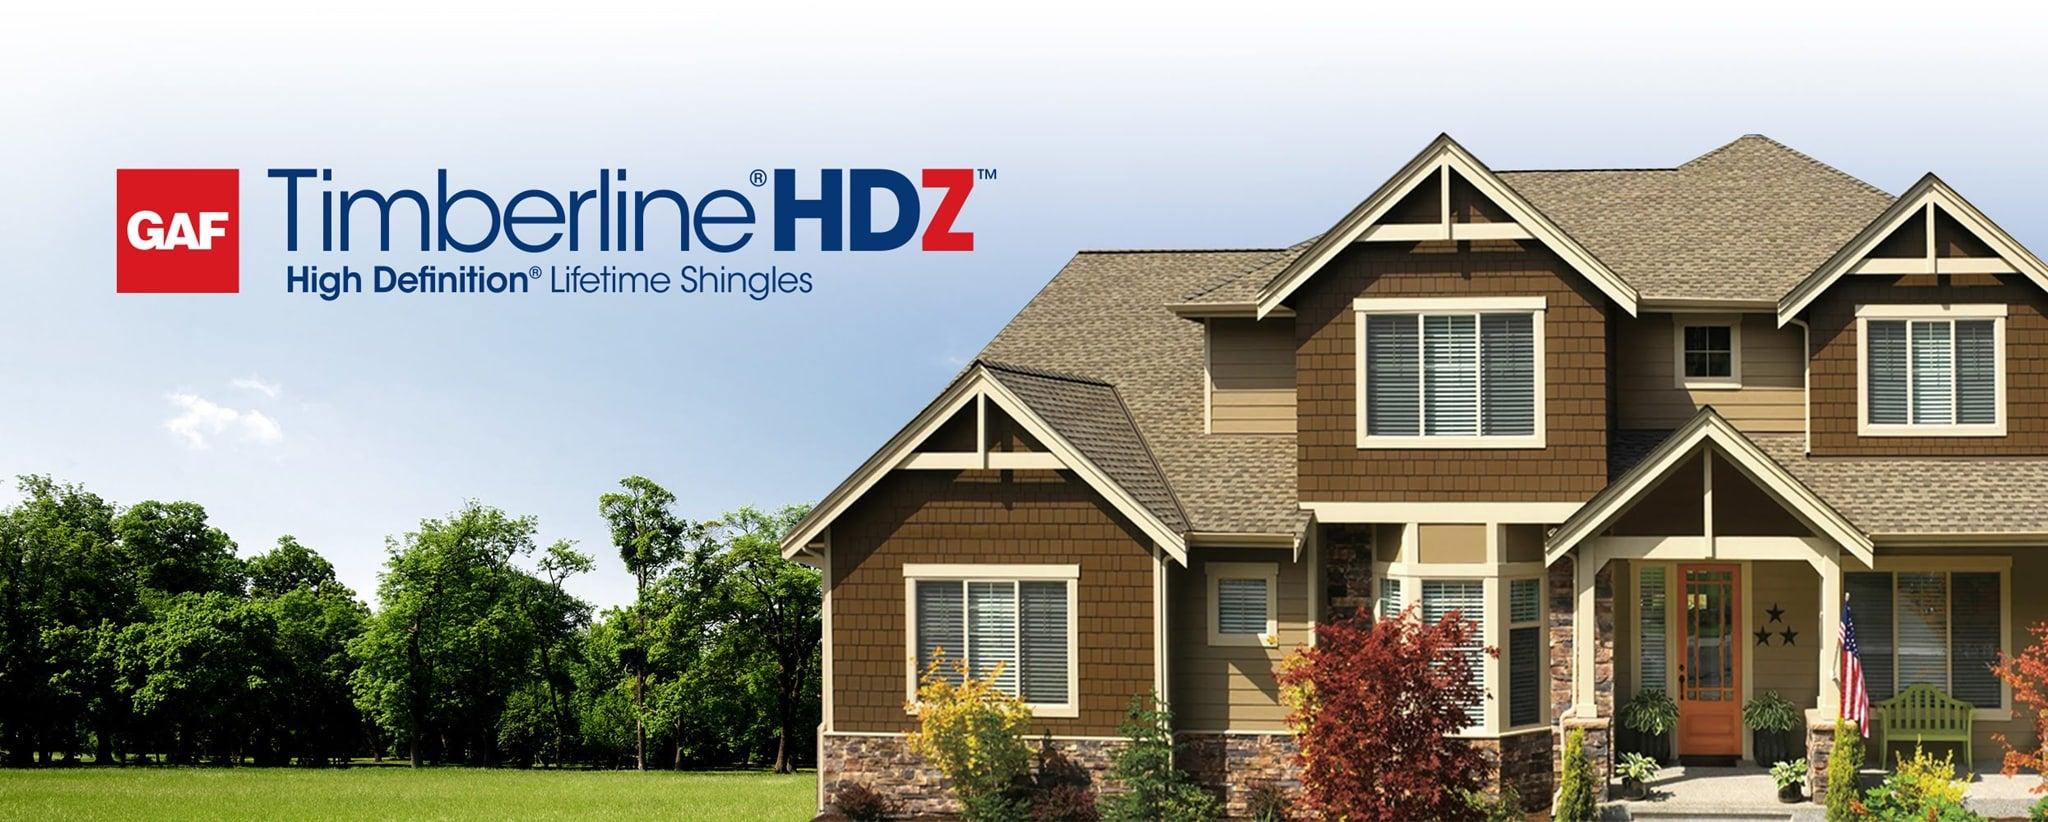 gaf timberline hd longevidade shingles